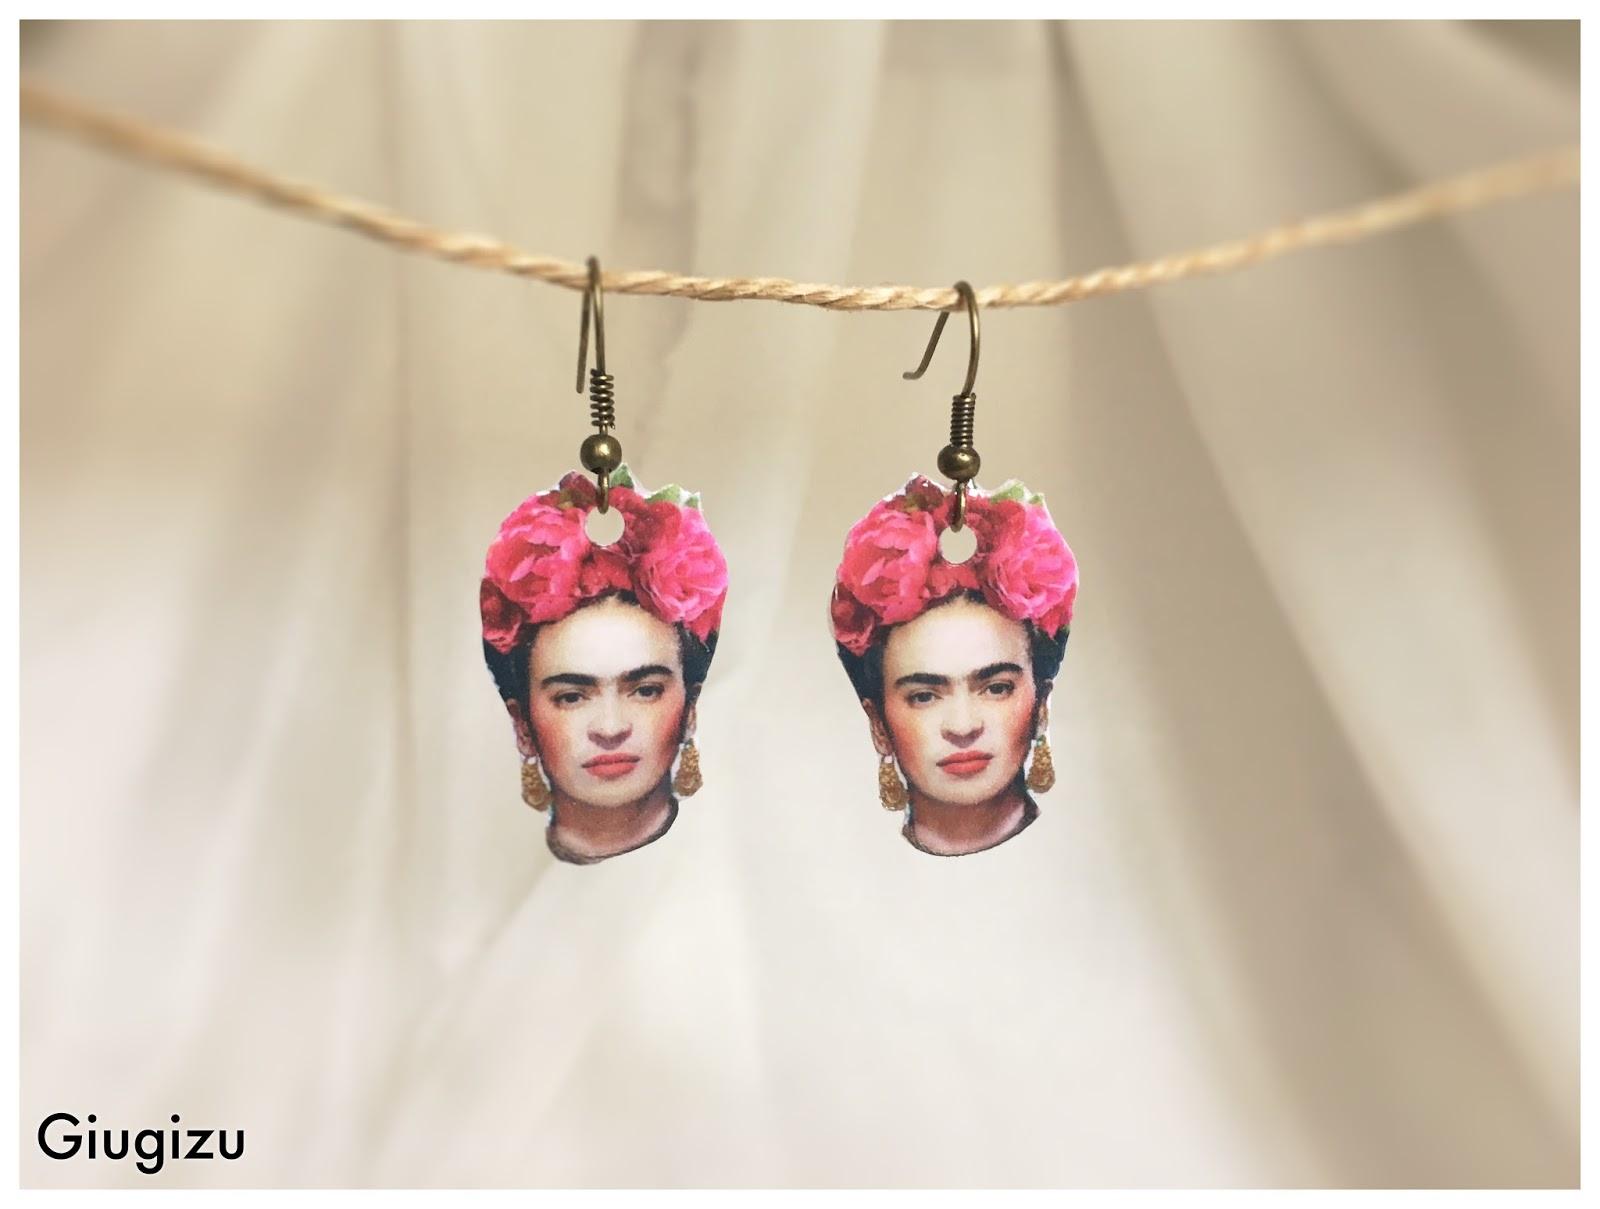 acquista per il più recente grande vendita stile attraente Giugizu's corner: Frida Kahlo Jewelry set part 2 - Parure ...